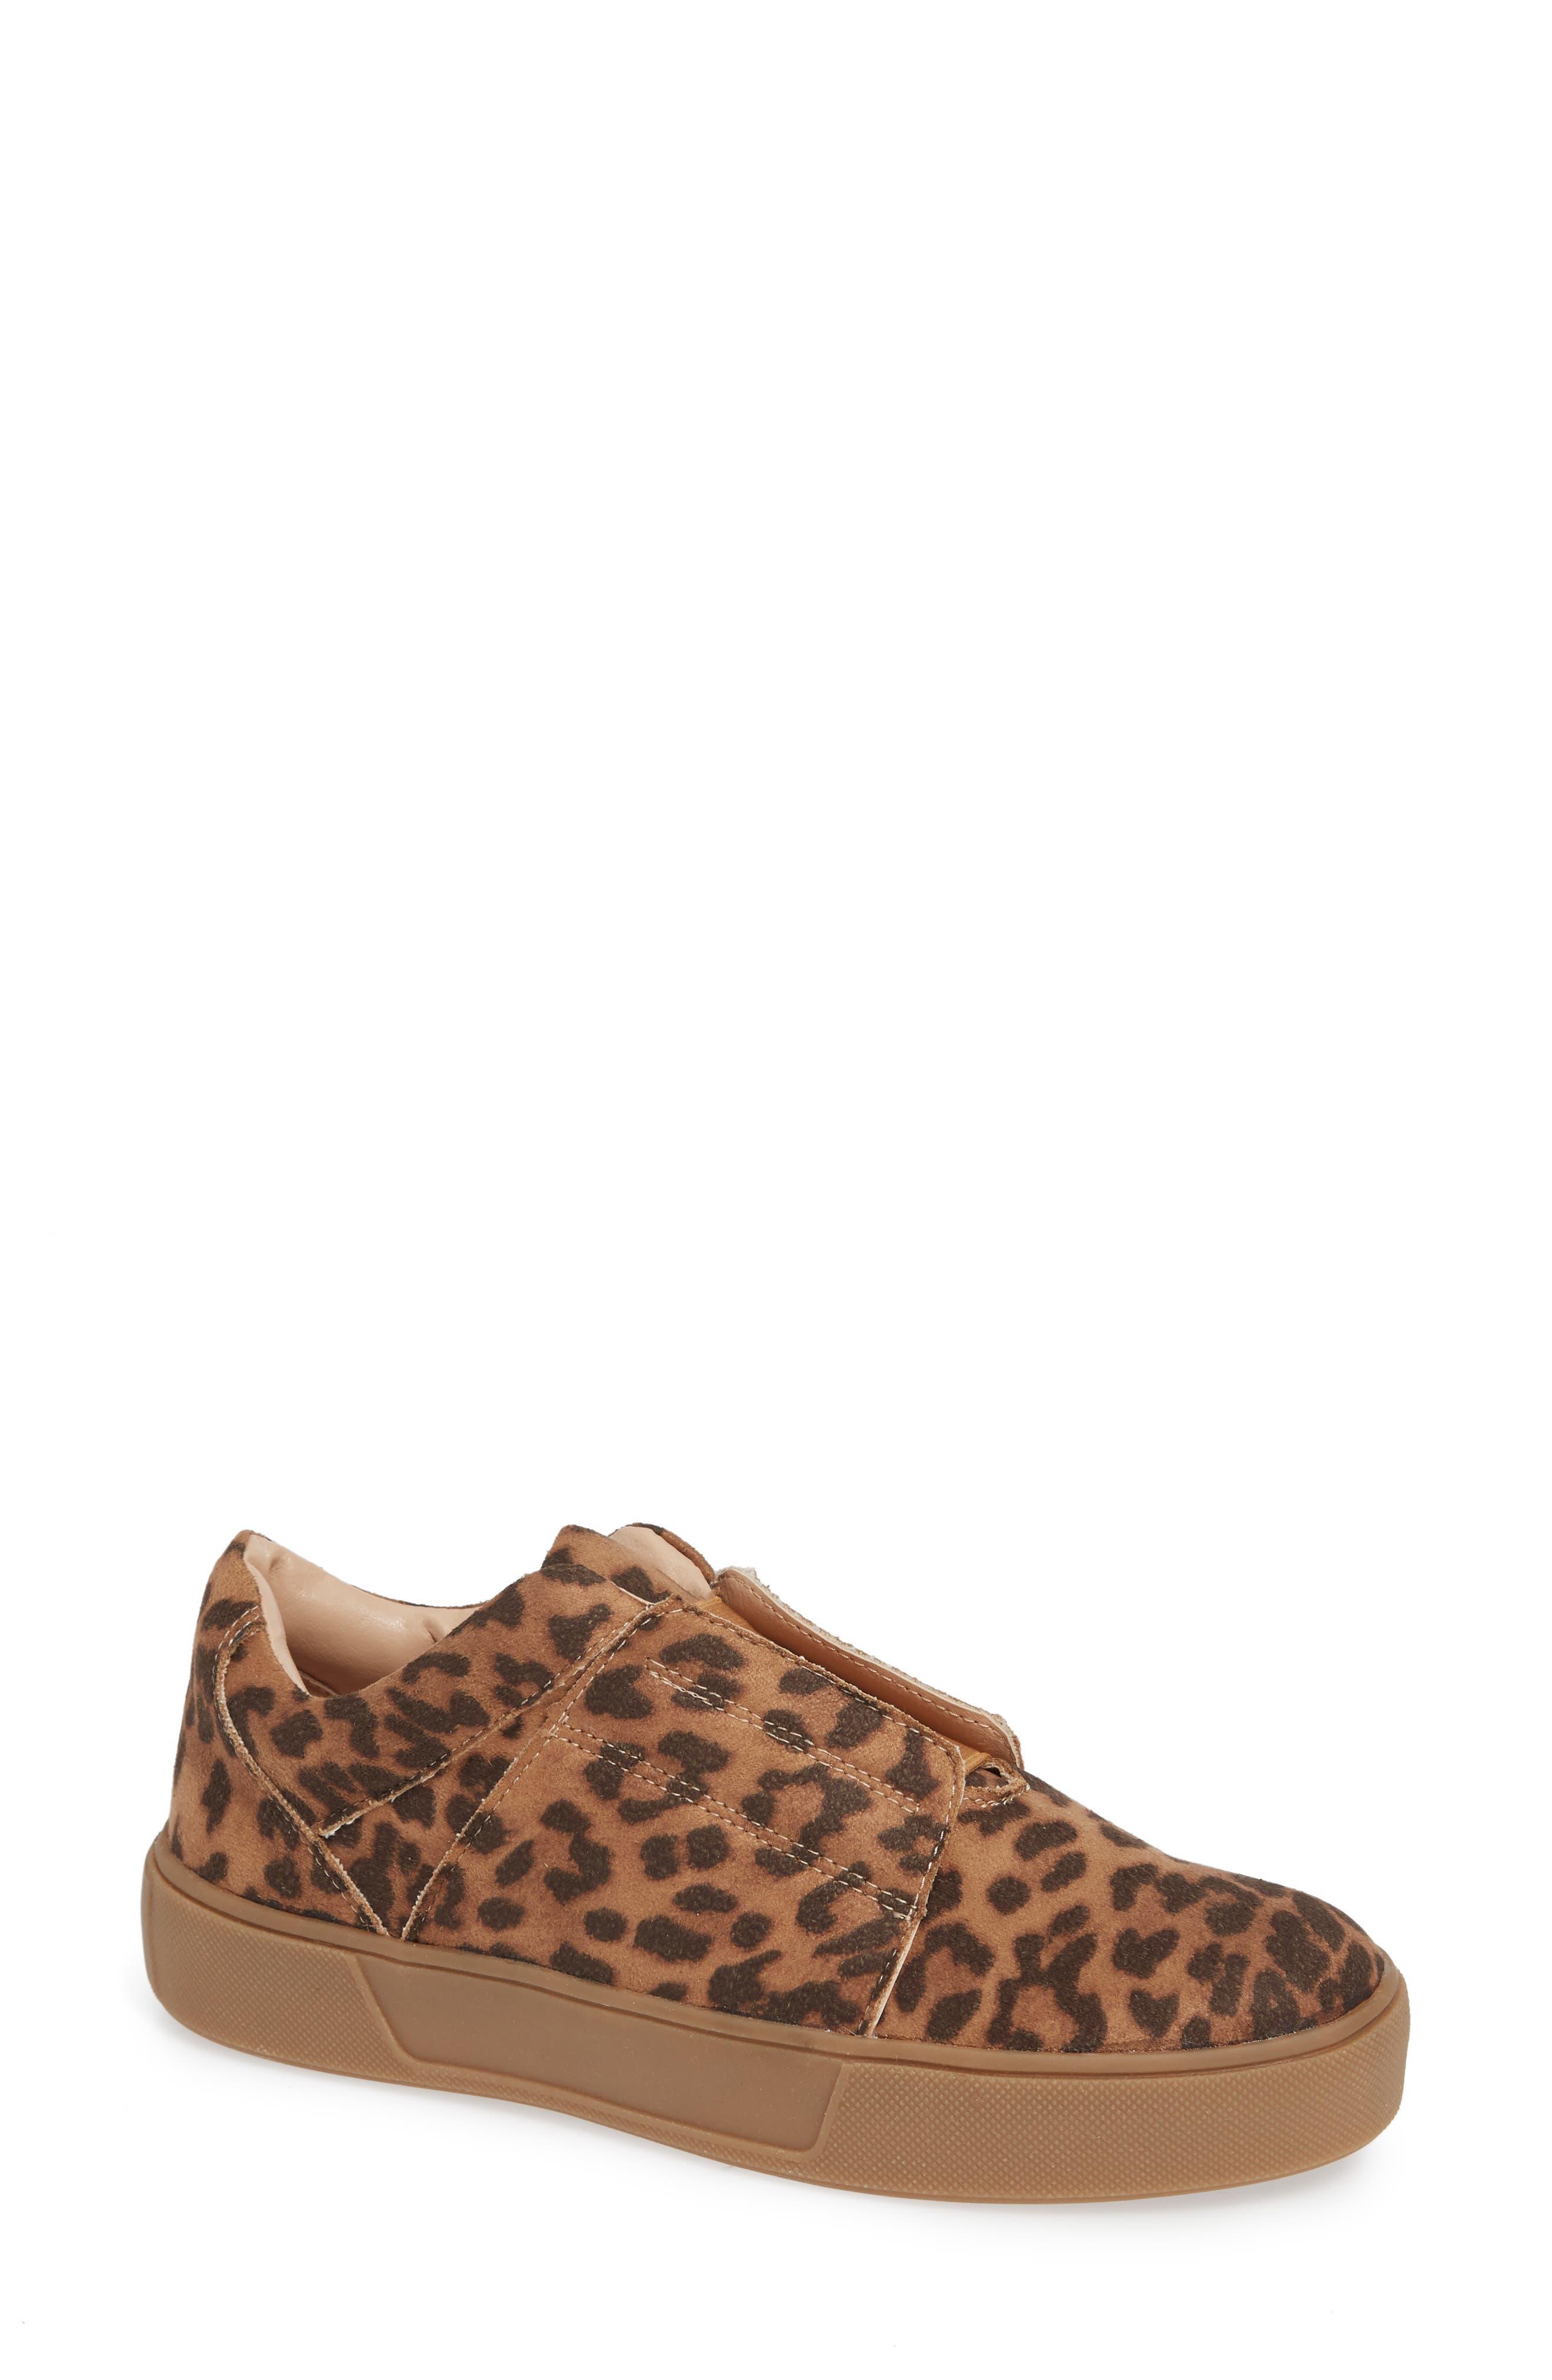 Tamera Slip-On Sneaker, Main, color, TAN/ LEOPARD MULTI - FABRIC